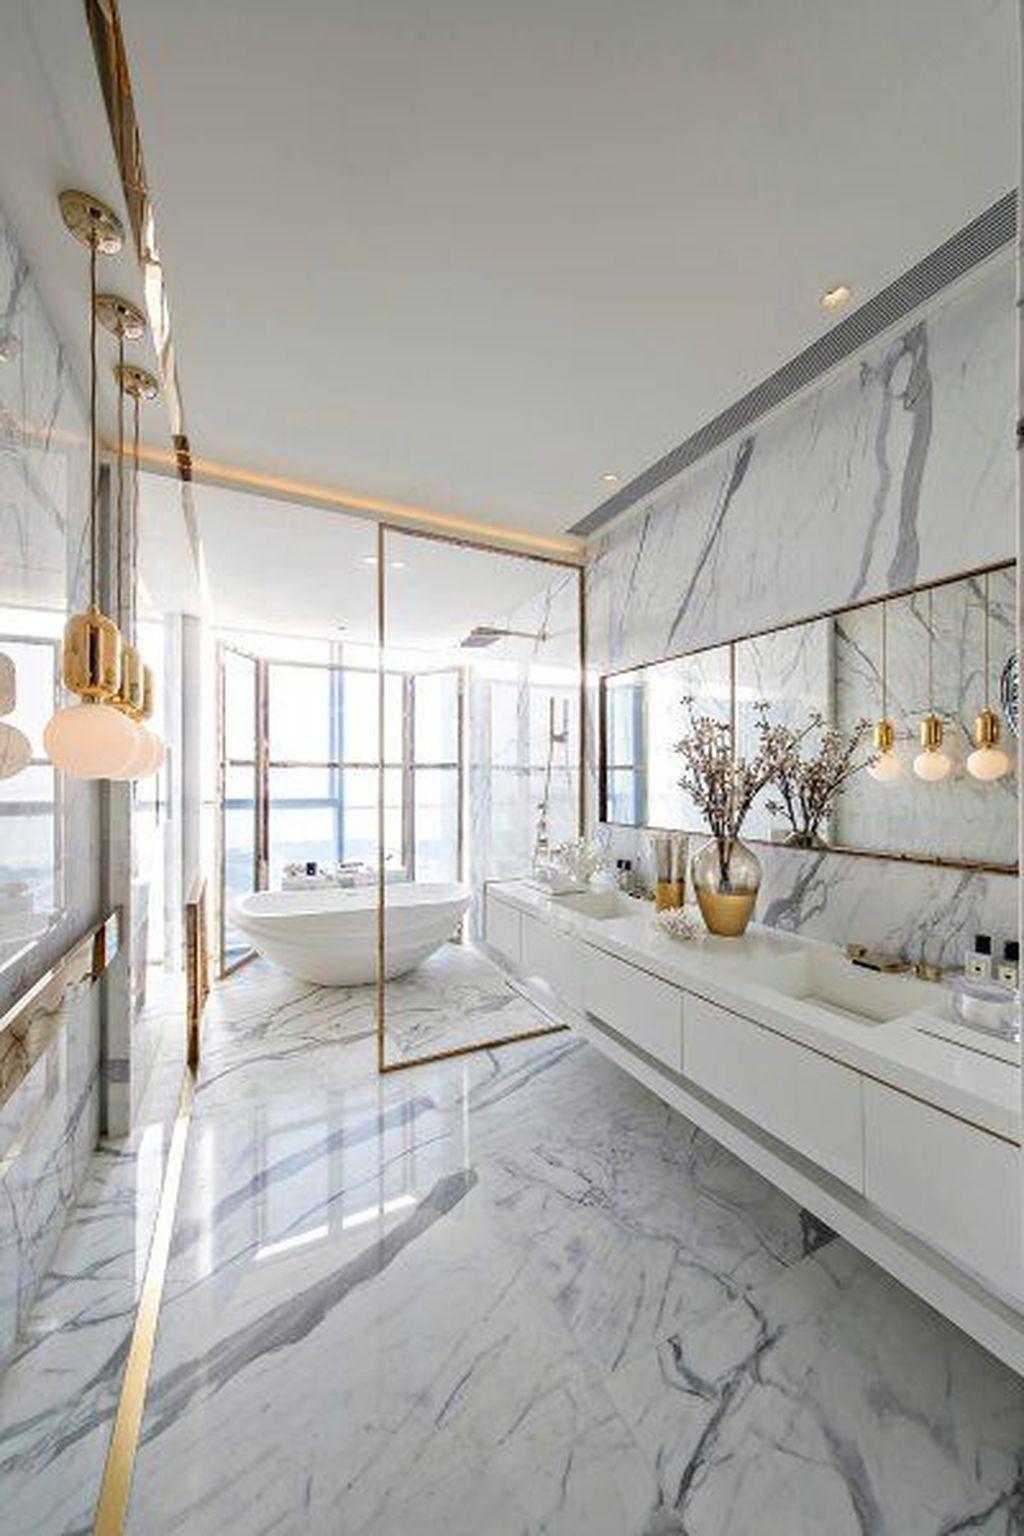 44 Popular Modern Contemporary Bathroom Design Ideas To Make Luxurious Look Contemporary Home Decor Bathroom Interior Design Modern Interior Design